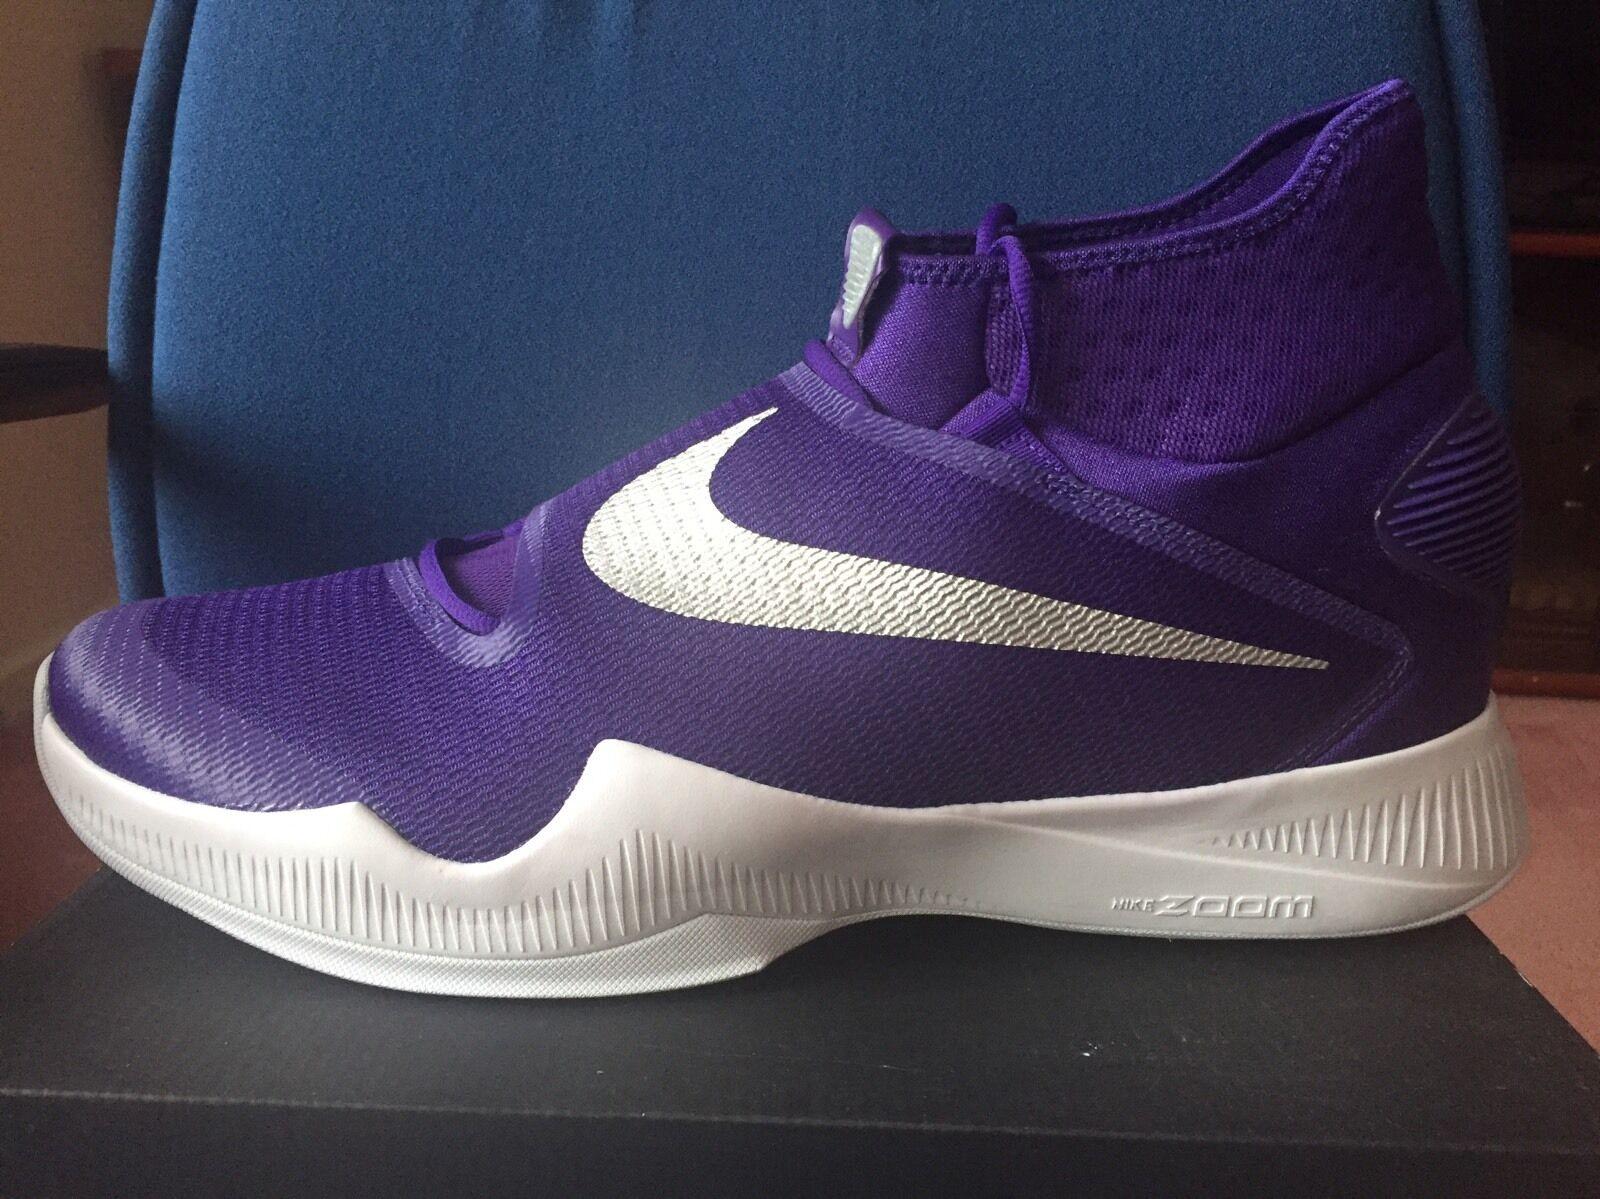 Nike Zoom Hyperrev 2016 Kobe Lakers Purple 18 Grape White Mens Basketball Shoes